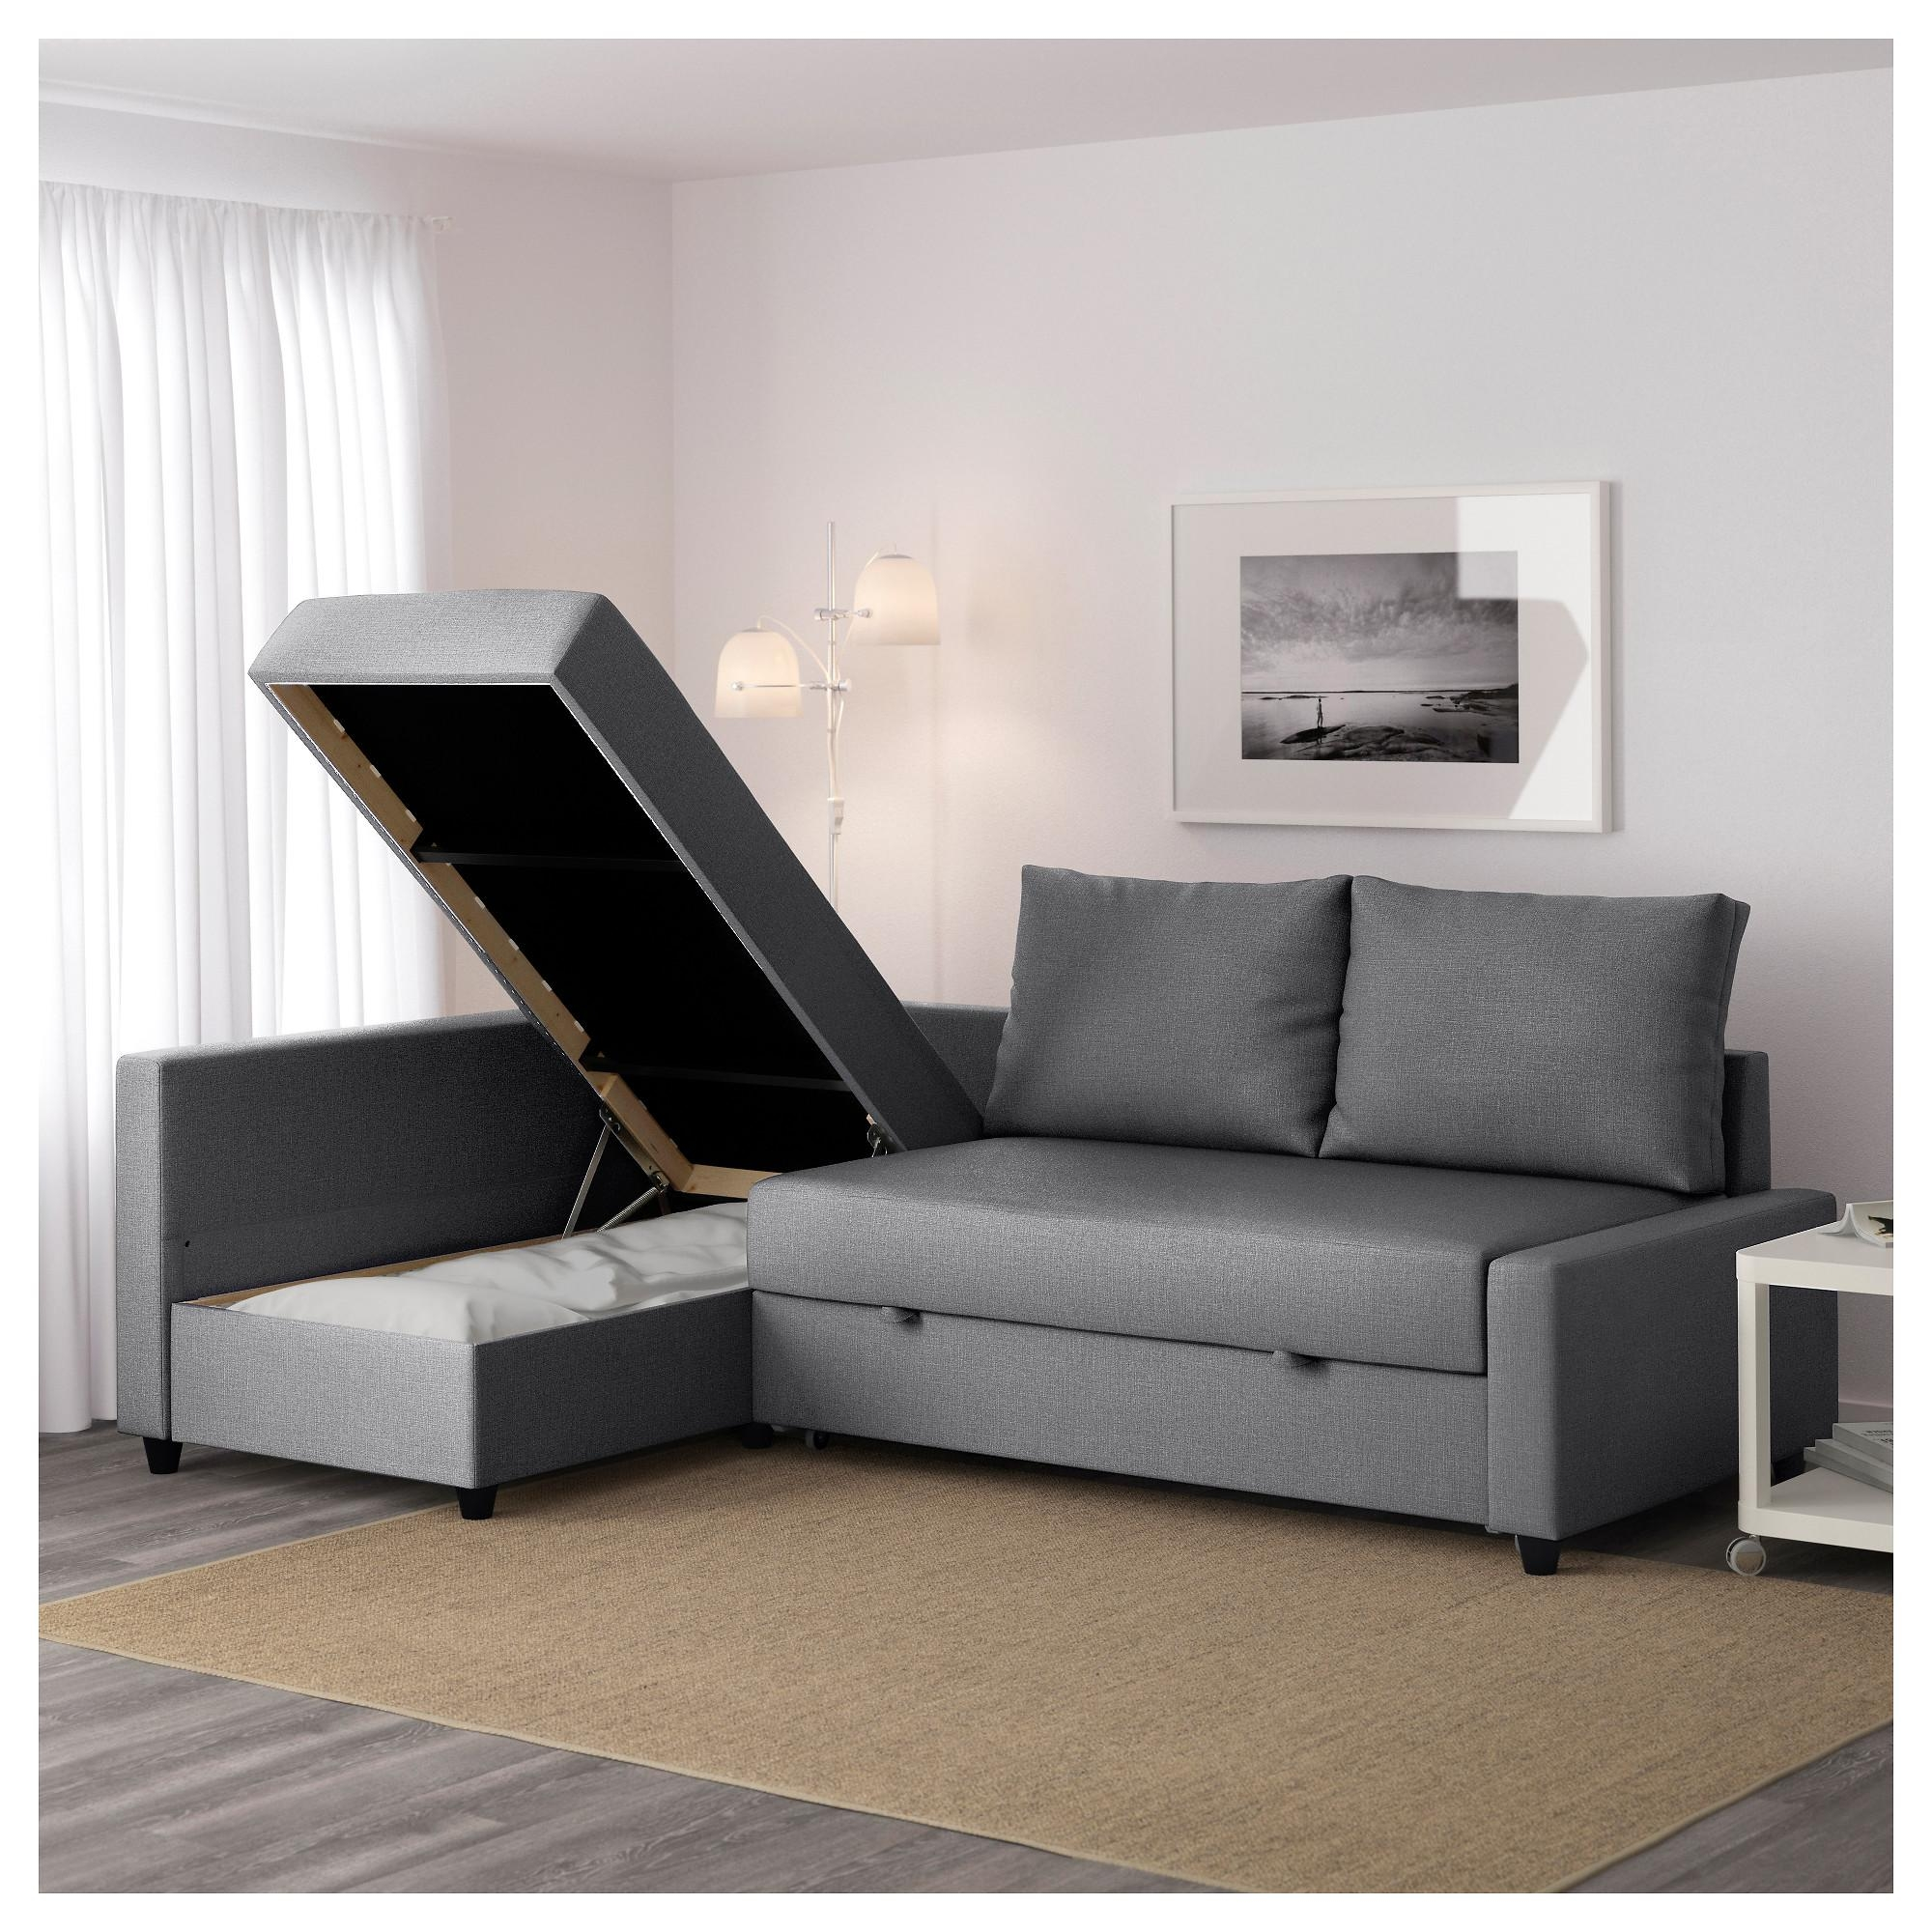 Furniture: Ikea Sofa Beds | Ikea Queen Sofa Bed | Ikea Sofa Bunk Bed For Queen Sofa Beds (View 17 of 20)